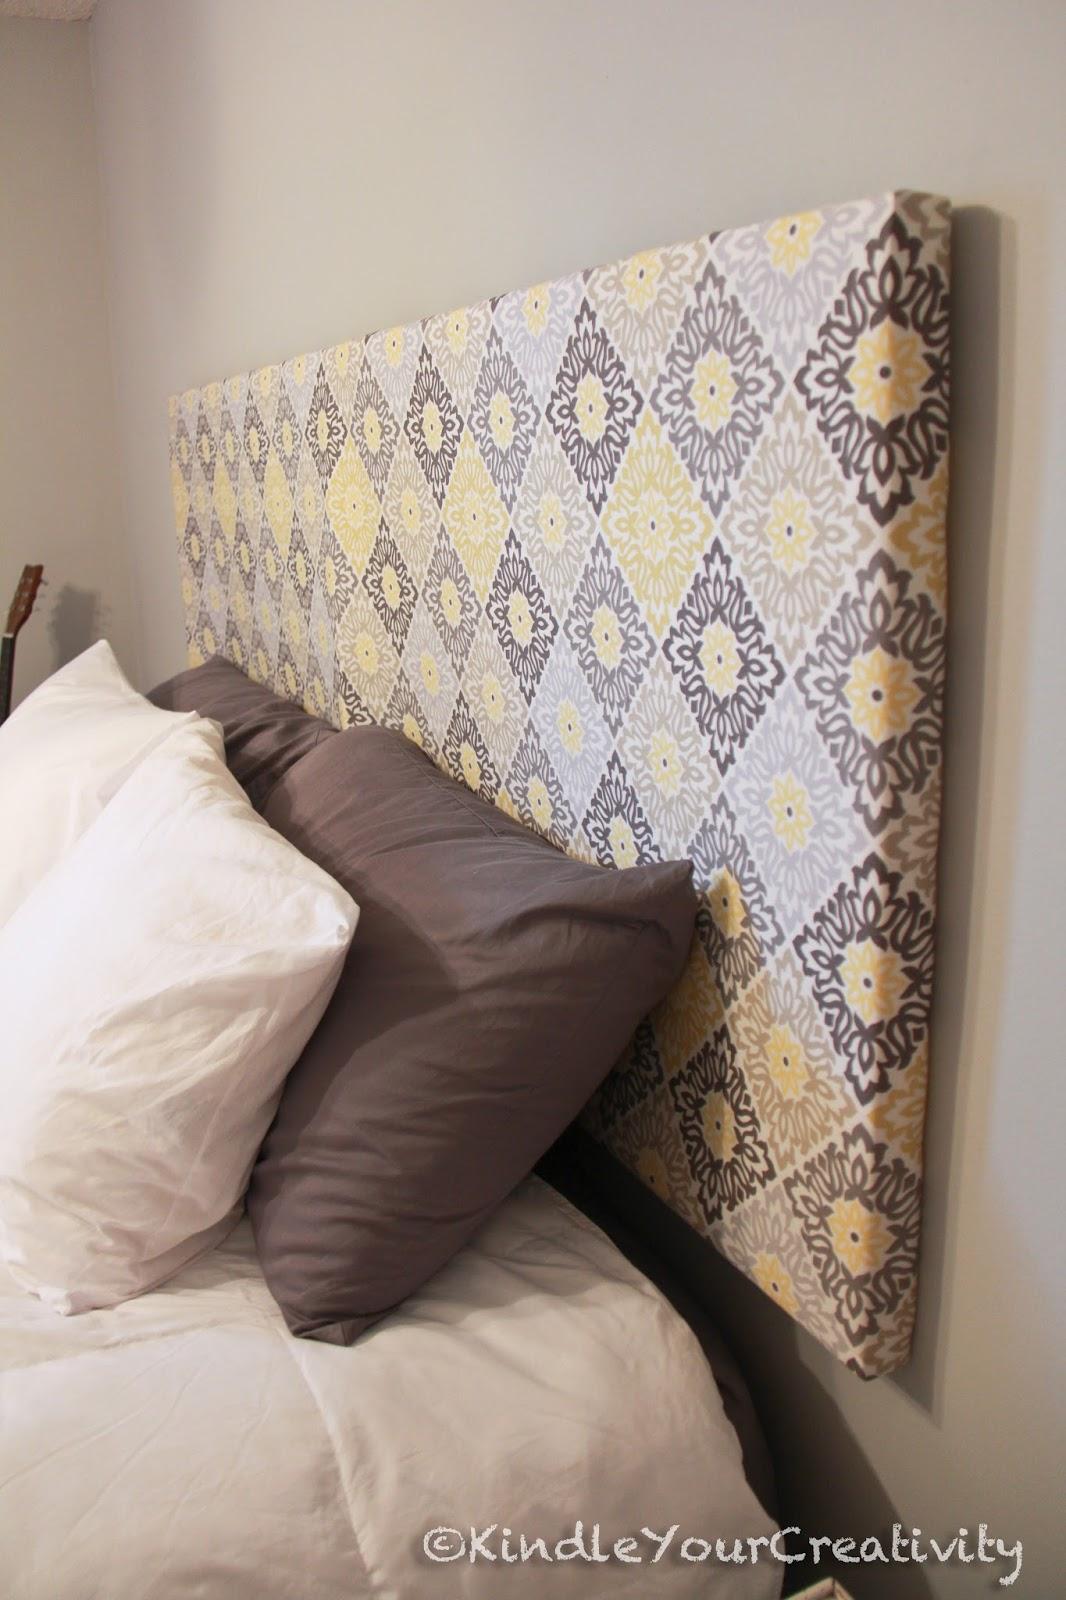 Kindle your creativity master bedroom redo diy fabric headboard solutioingenieria Gallery